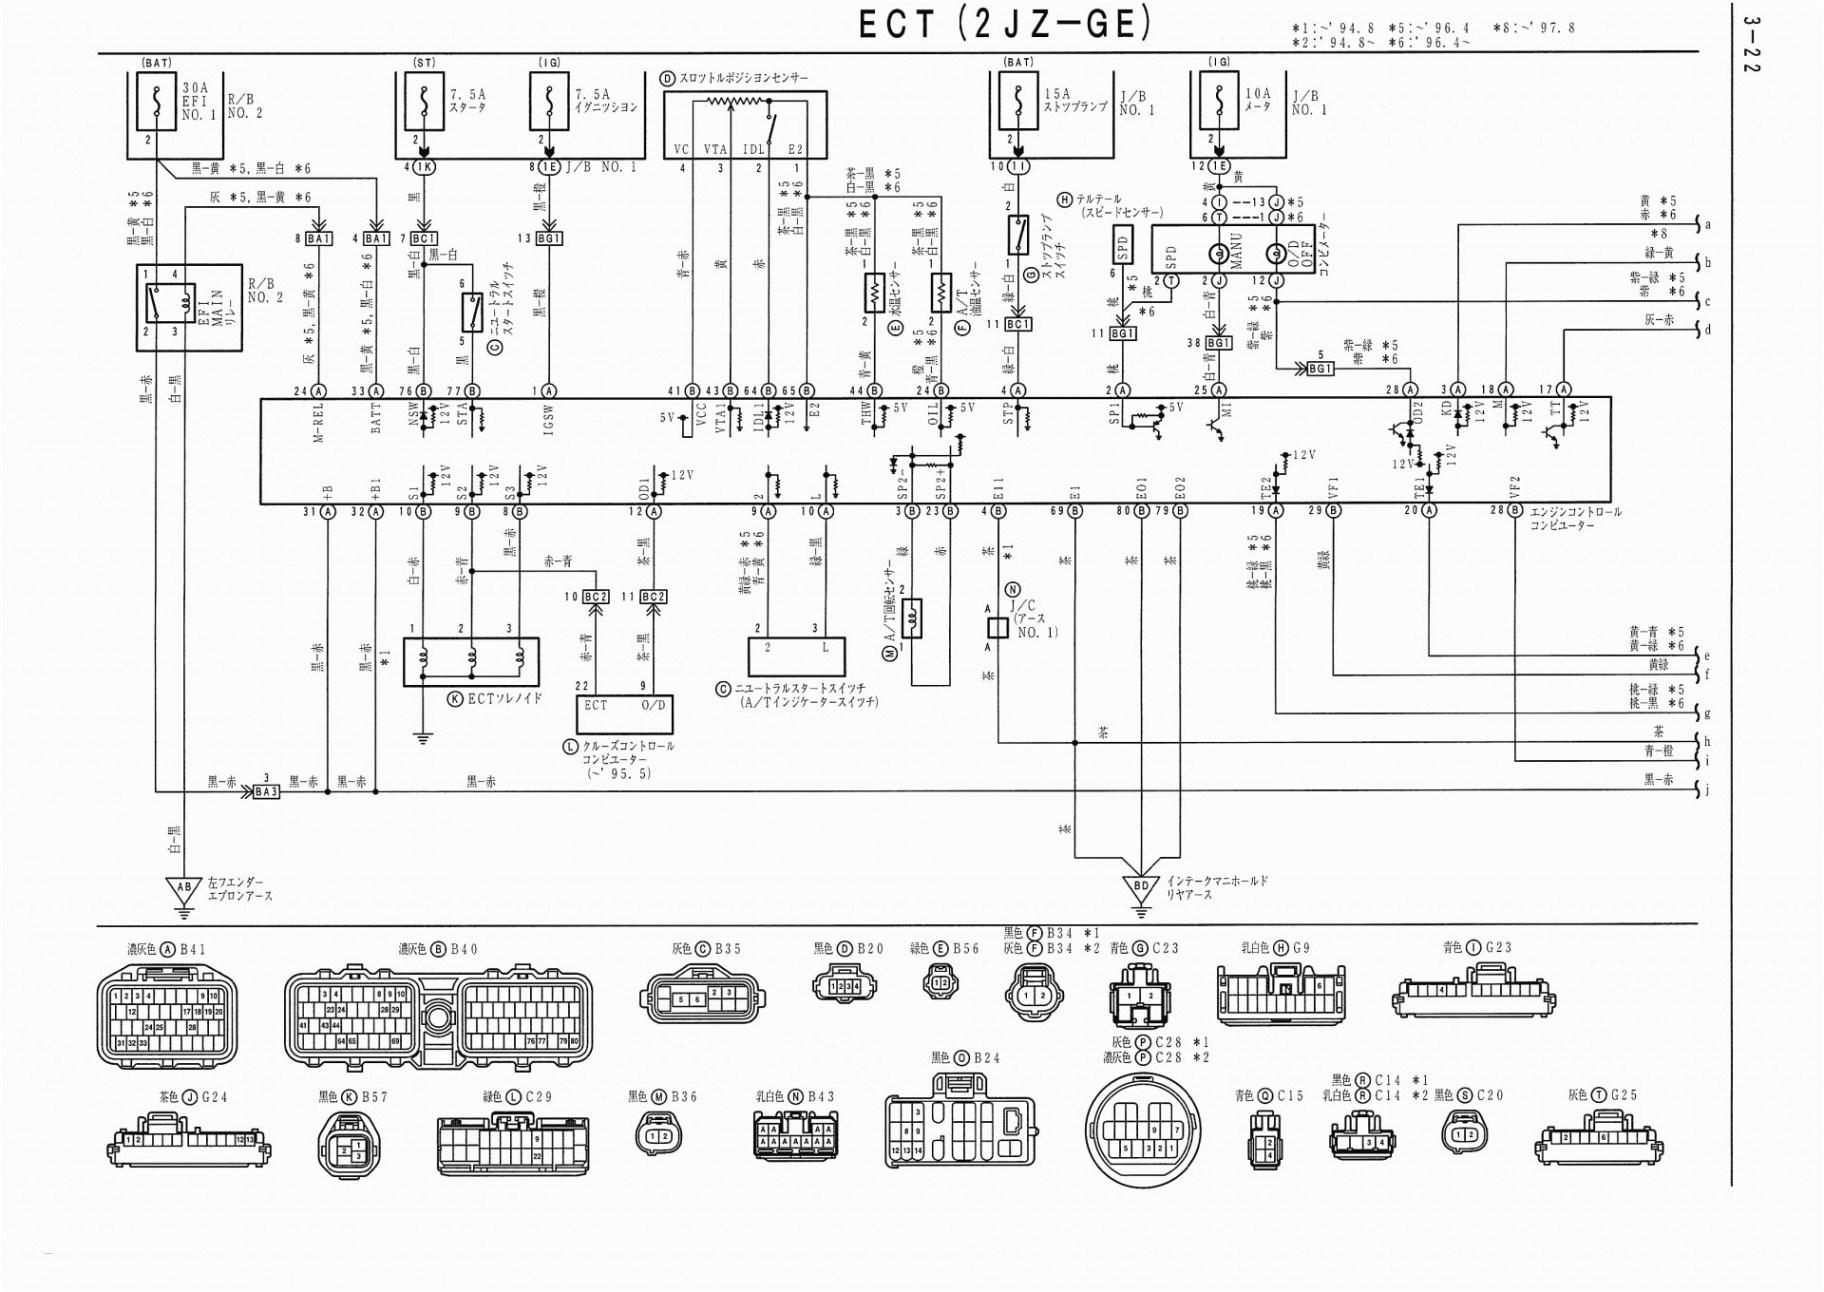 network wiring diagram